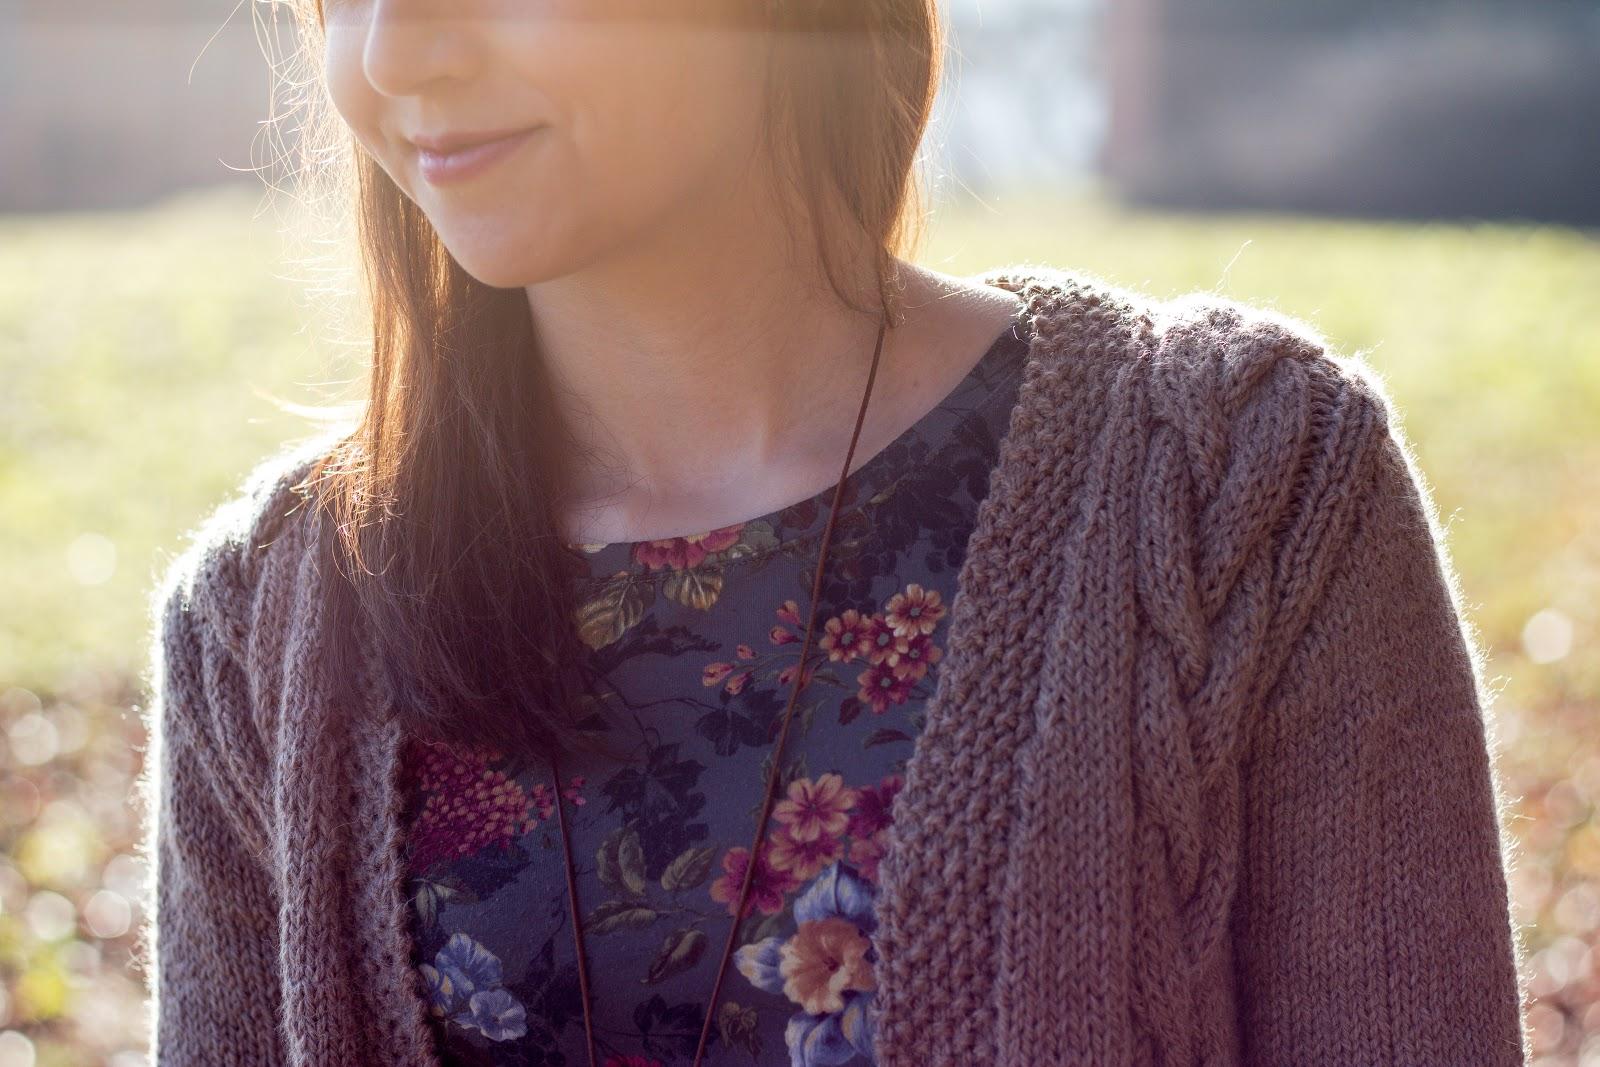 Lange Strickjacke mit Zopfmuster selber stricken - kostenlose Anleitung - Jacke selber machen - Kleidung selber stricken - Long Cardigan Free Knitting Pattern German - DIY - handmade - 07